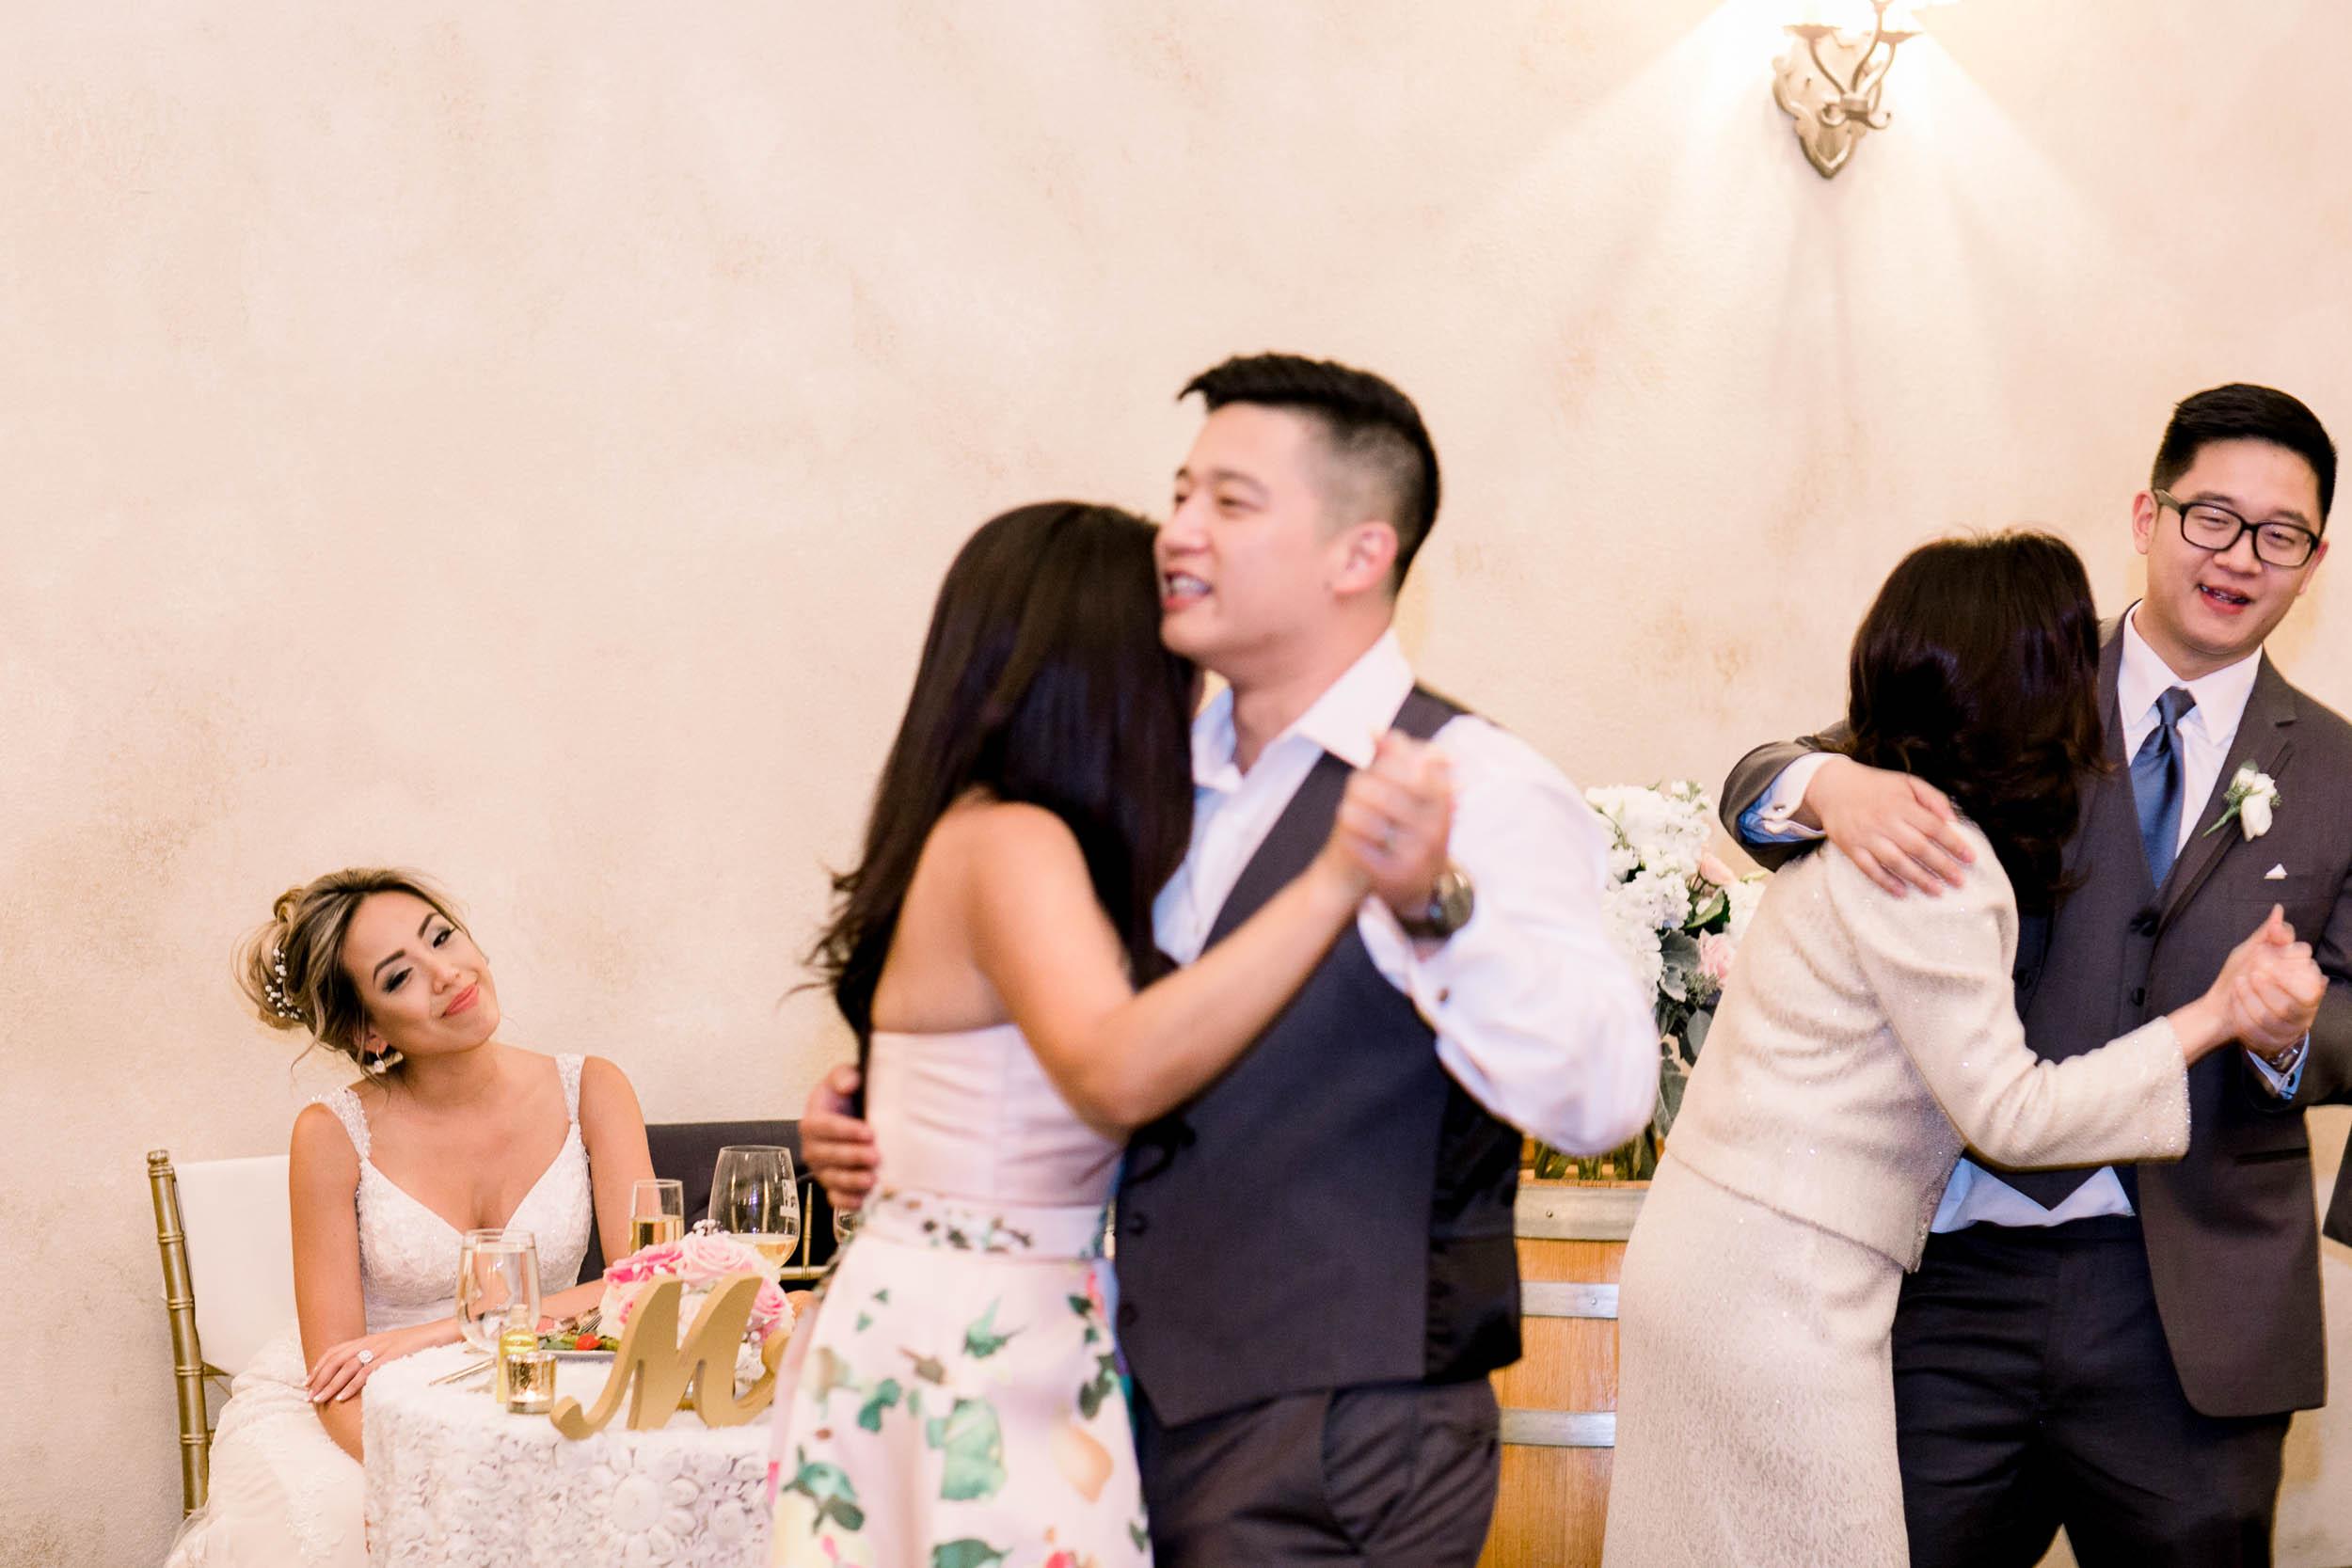 Las Positas Wedding_Buena Lane Photography_090118ER862.jpg